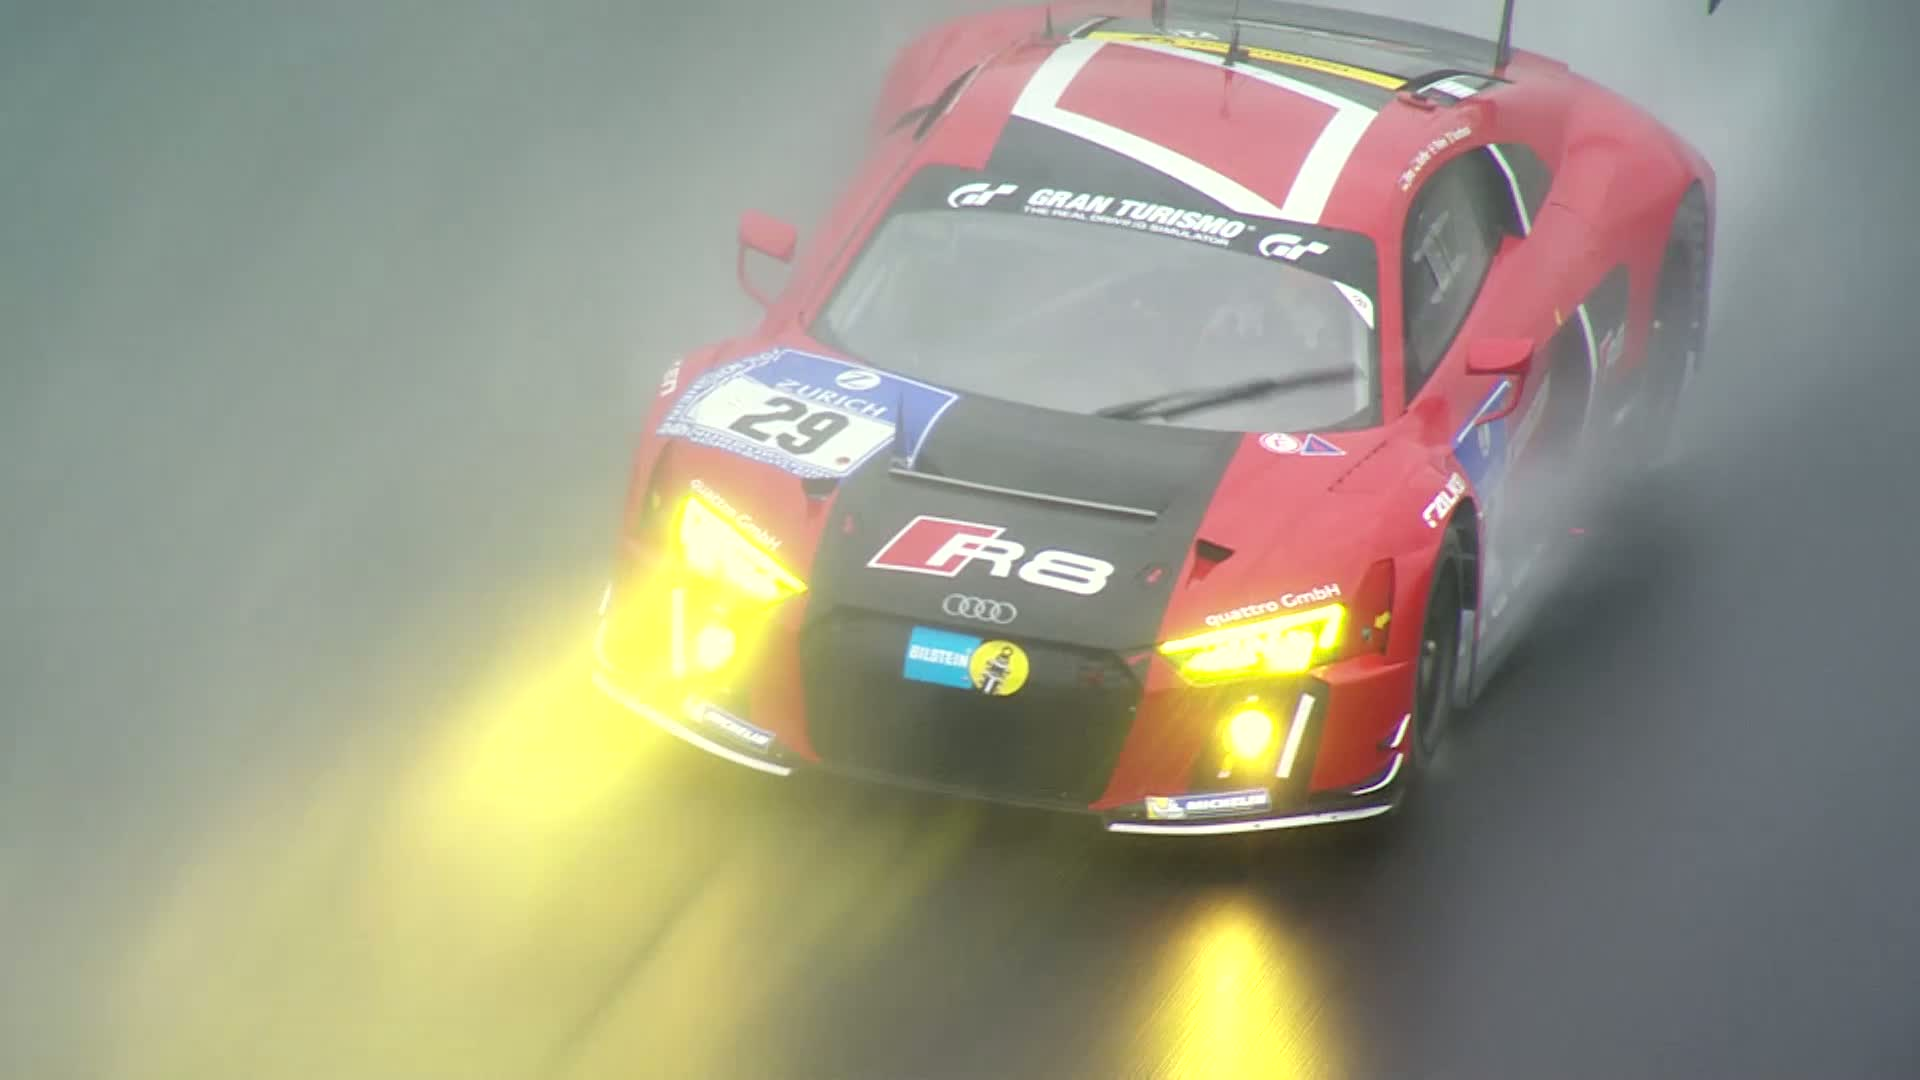 60 Seconds of Audi Sport 24/2015 - 24h Nürburgring, Ausblick